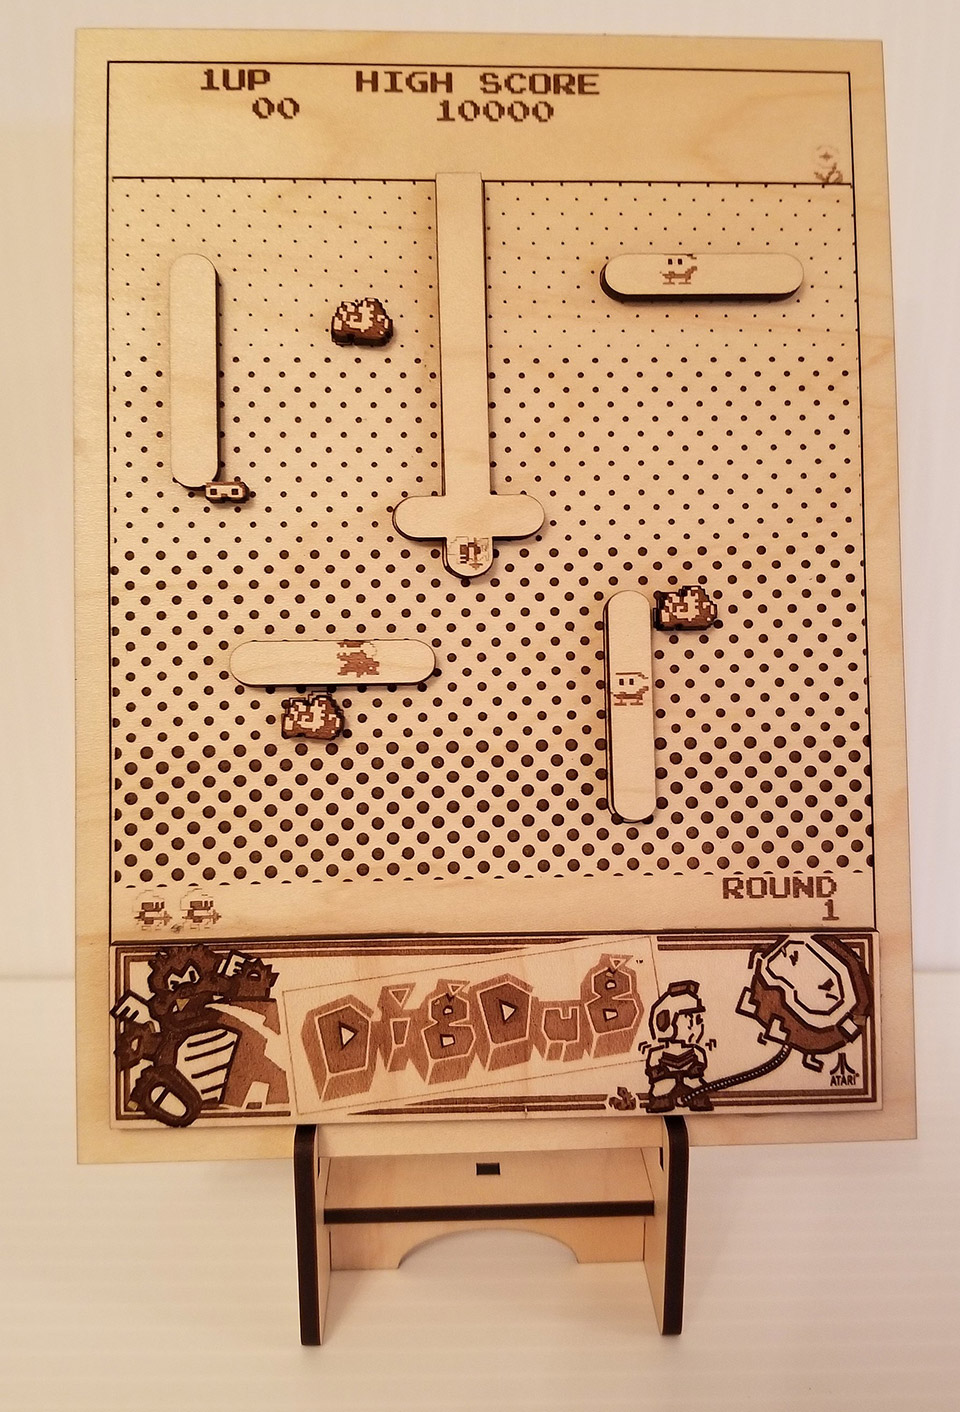 Laser-cut Arcade Art